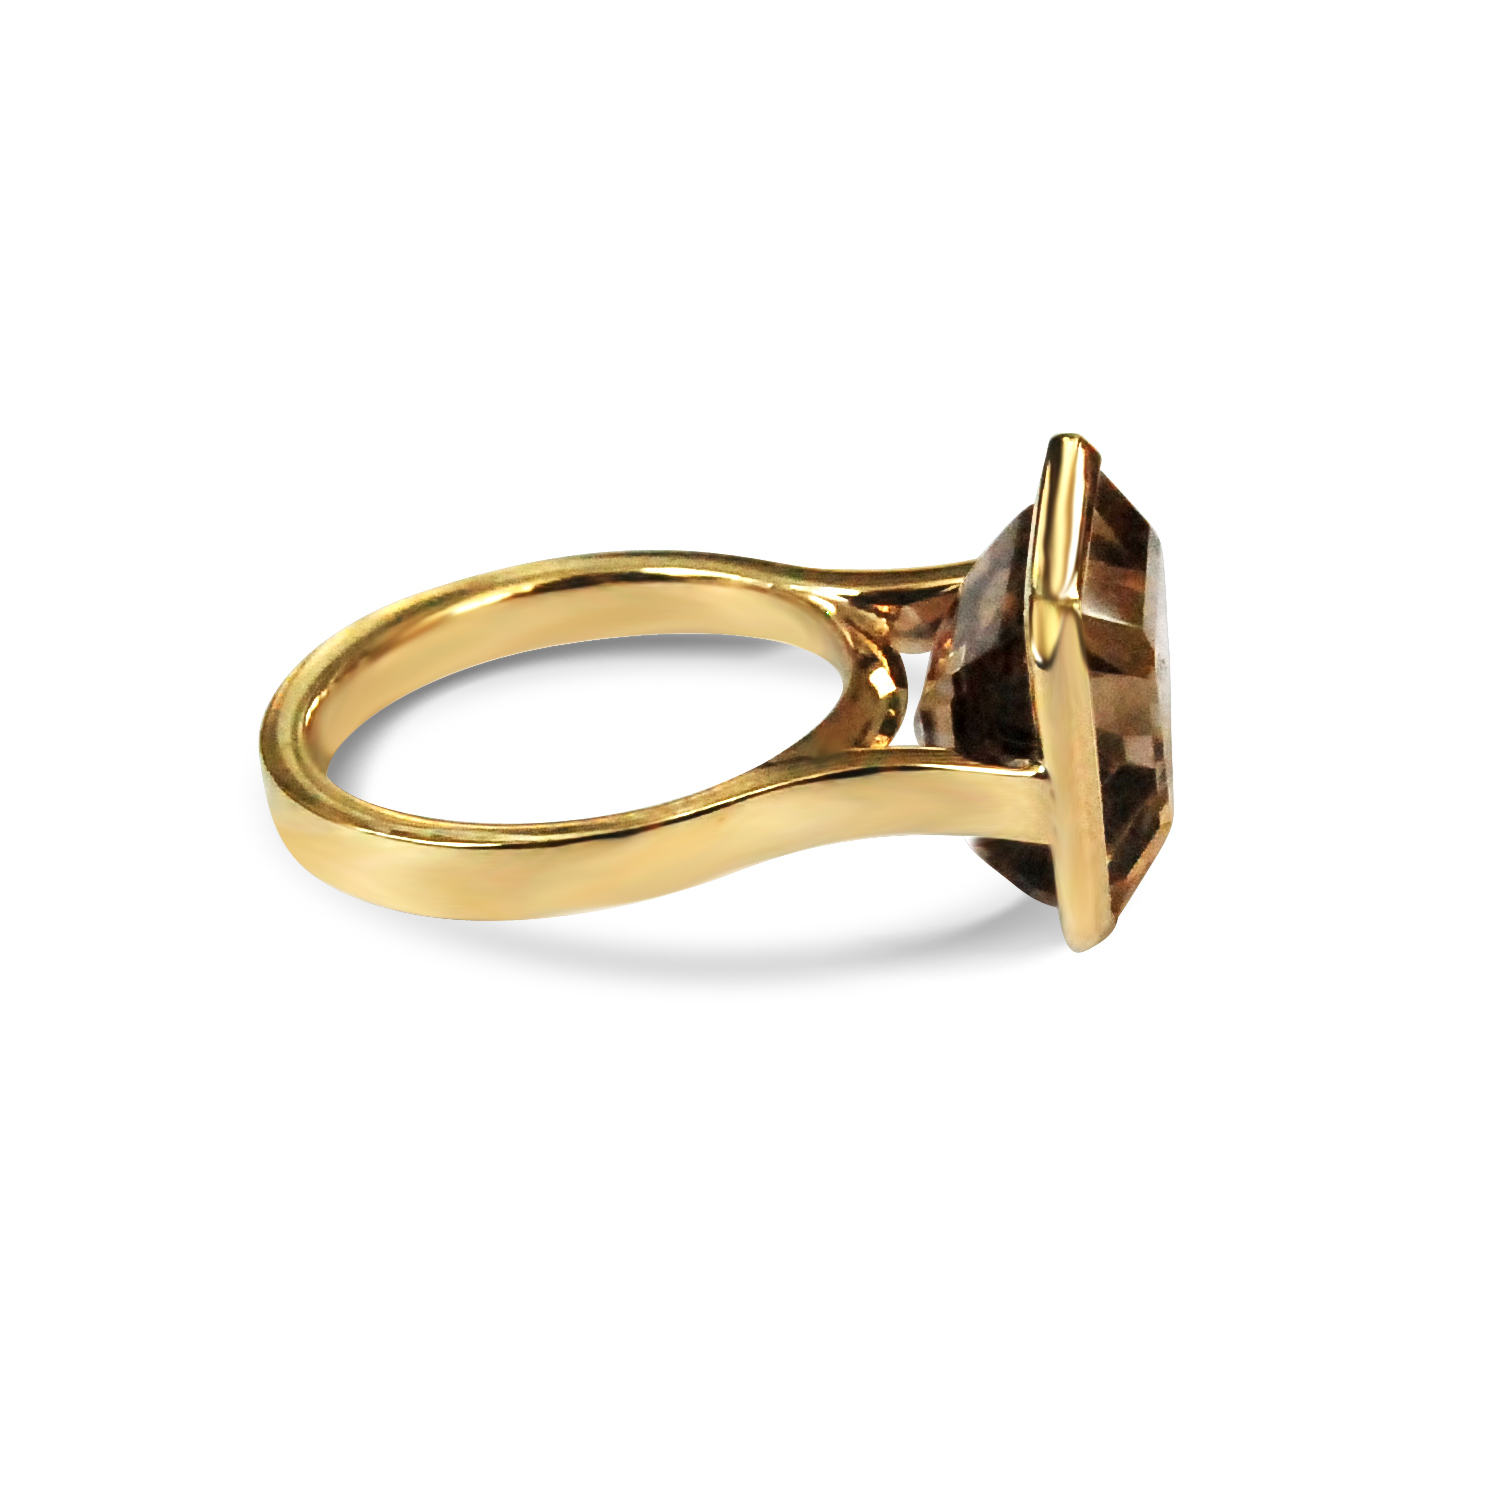 Smoky-quartz-and-yellow-gold-ring-2.jpg